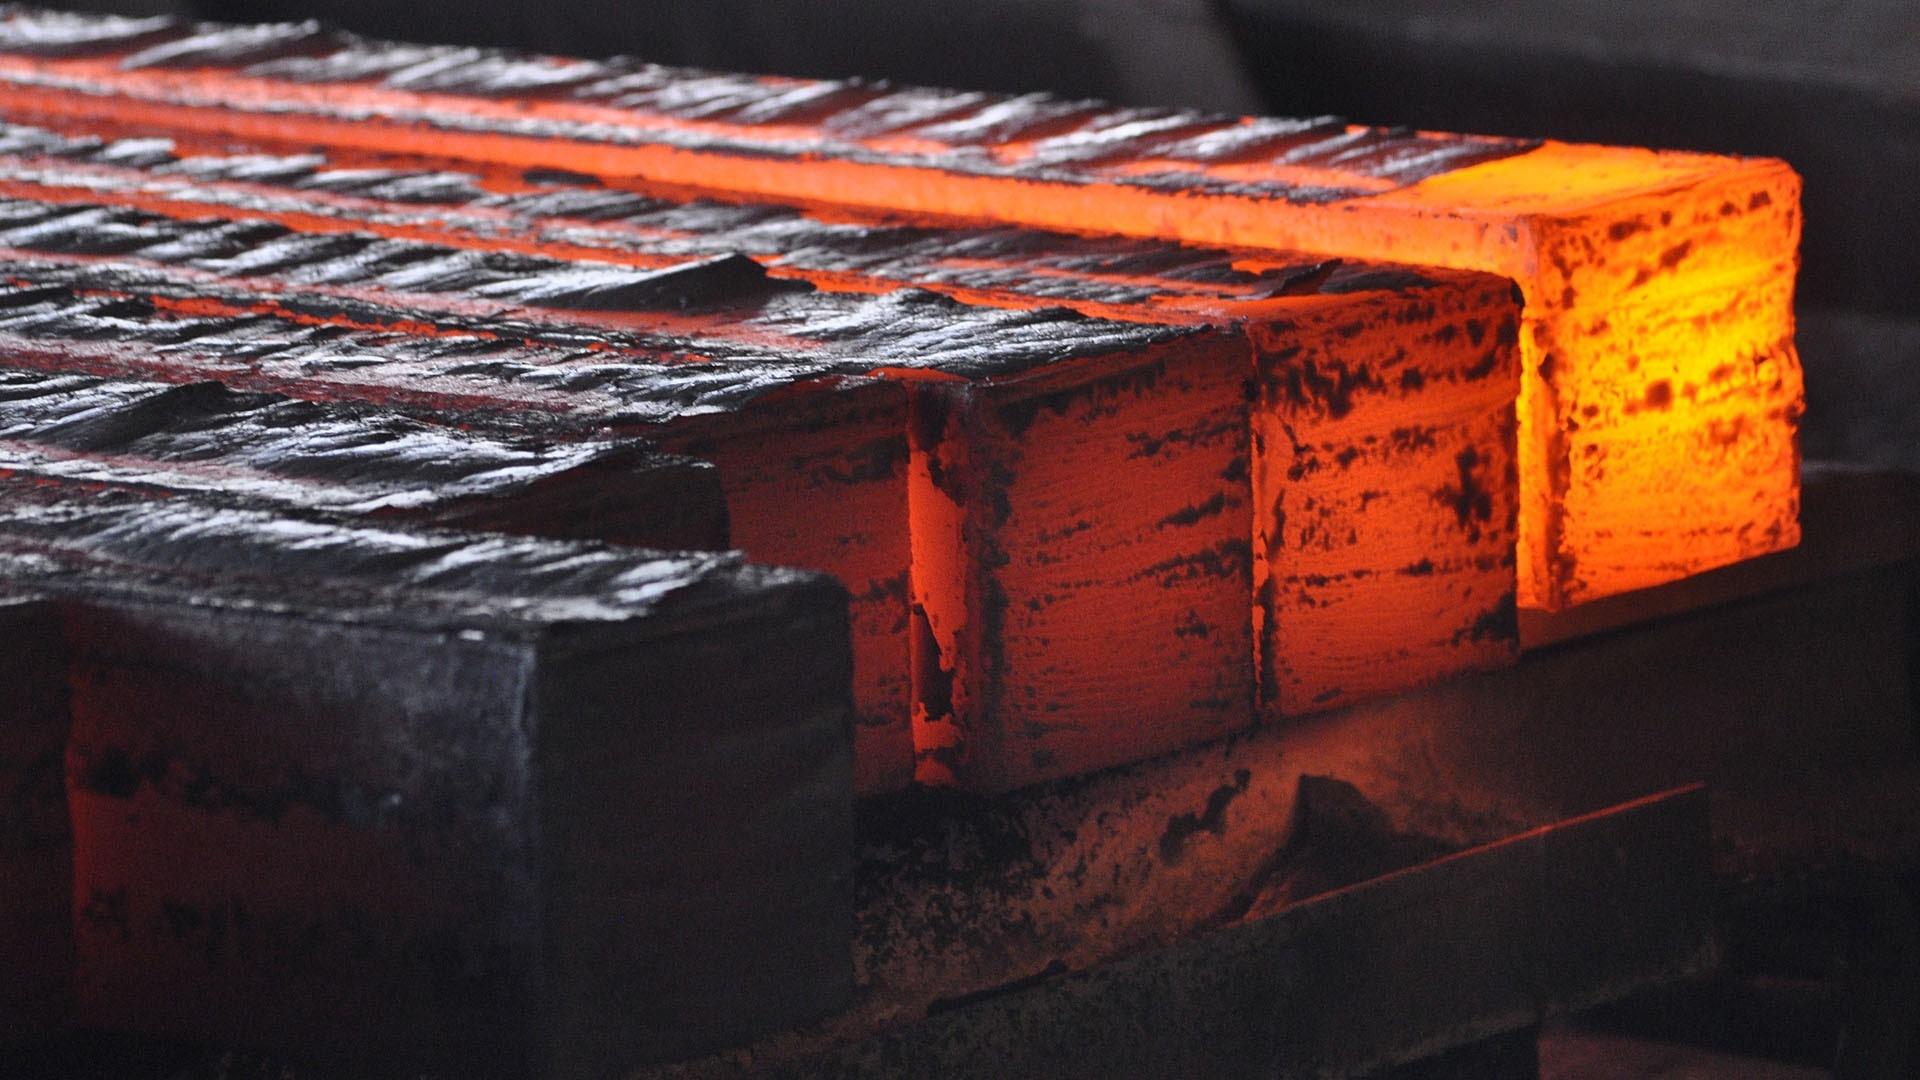 کارخانه ذوب آهن و نورد البرز